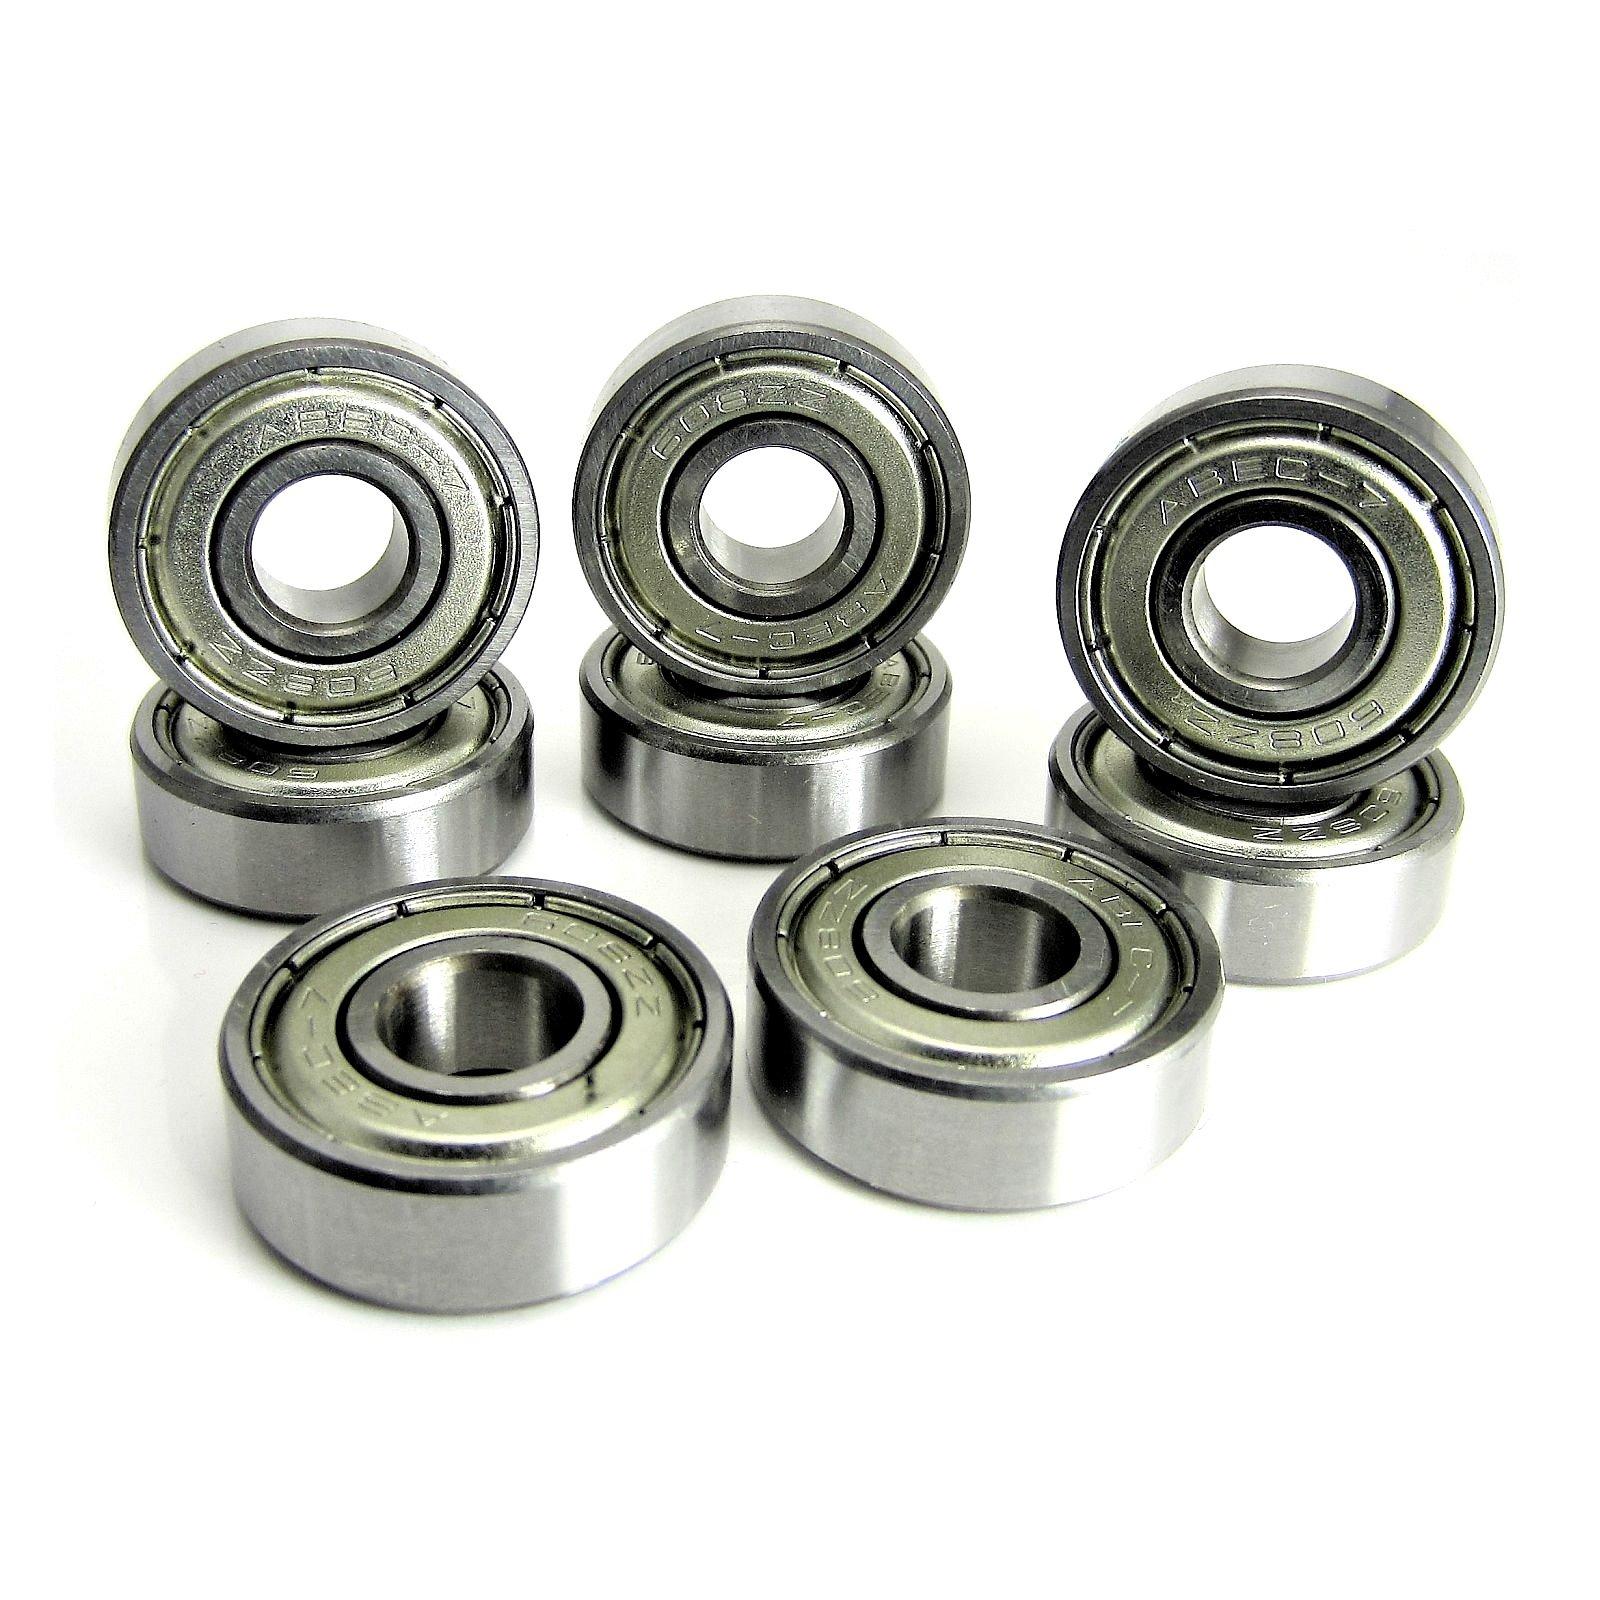 8x22x7mm ABEC 7 Precision Skate Ball Bearings Metal Shields (8) by TRB RC